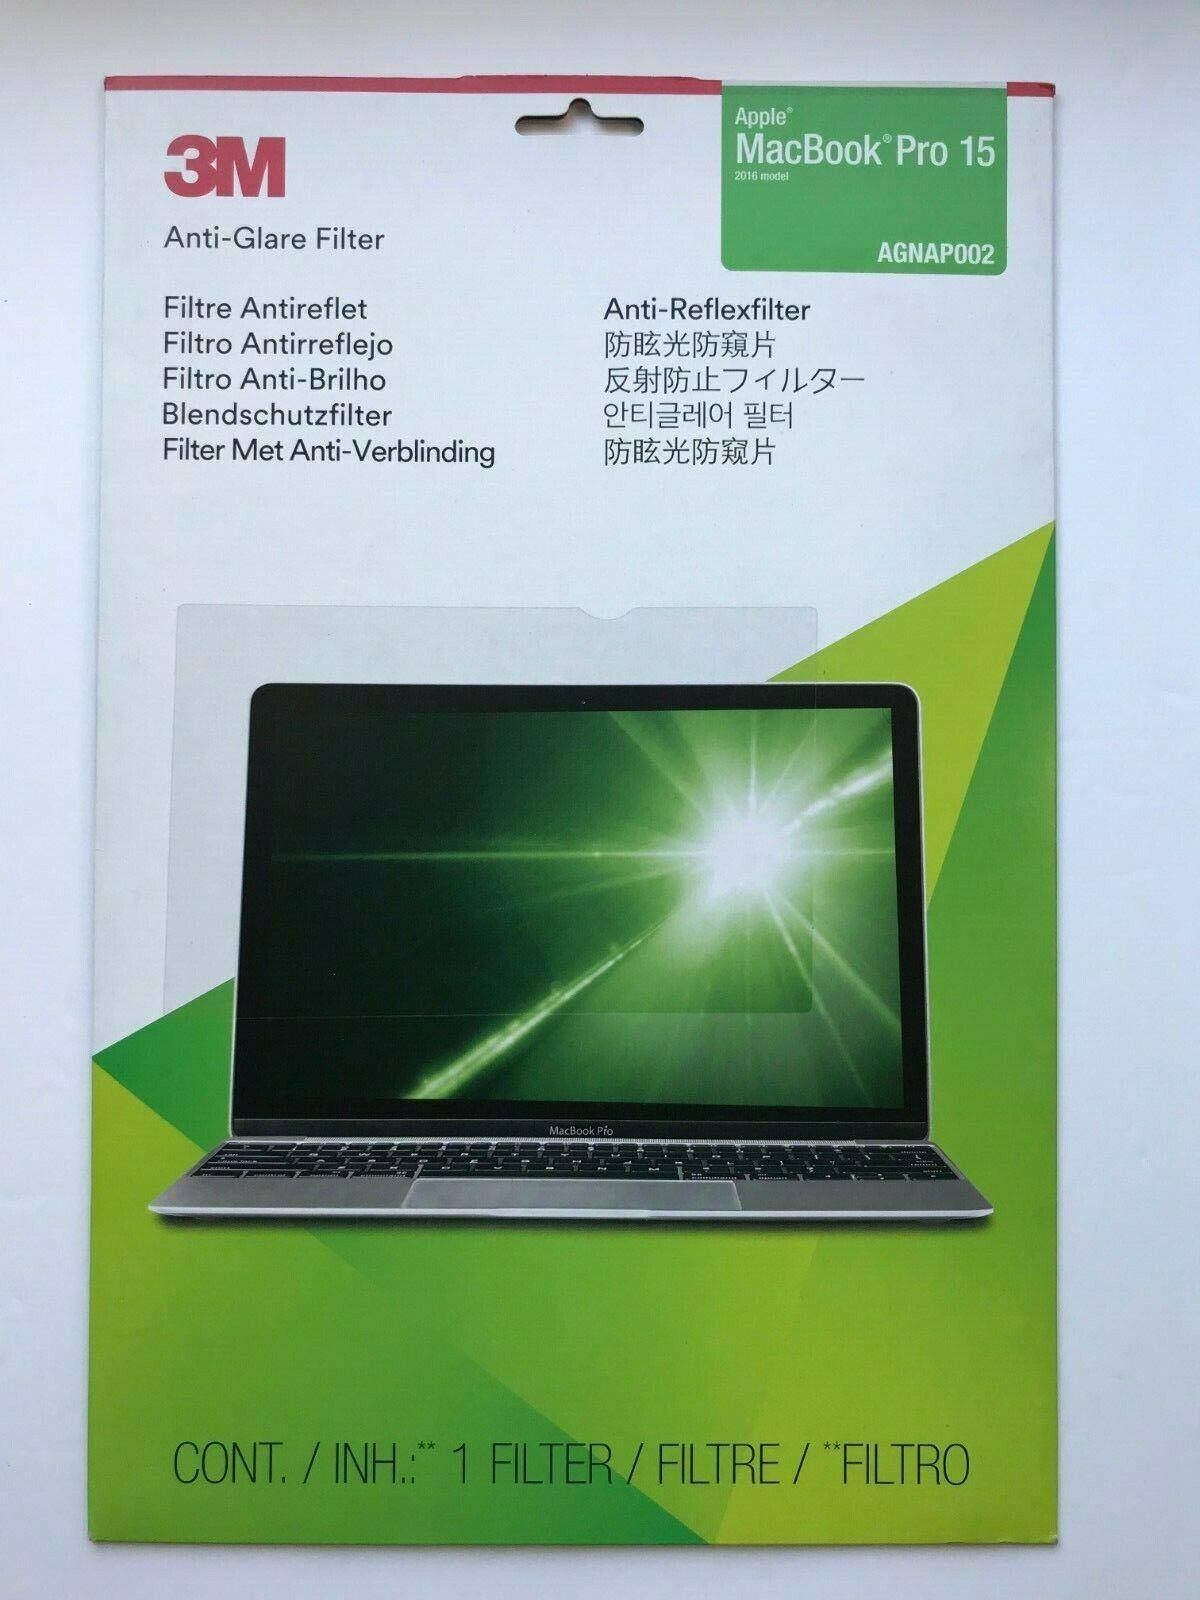 3M Anti-Glare Filter for Apple MacBook Pro 15 2016 model